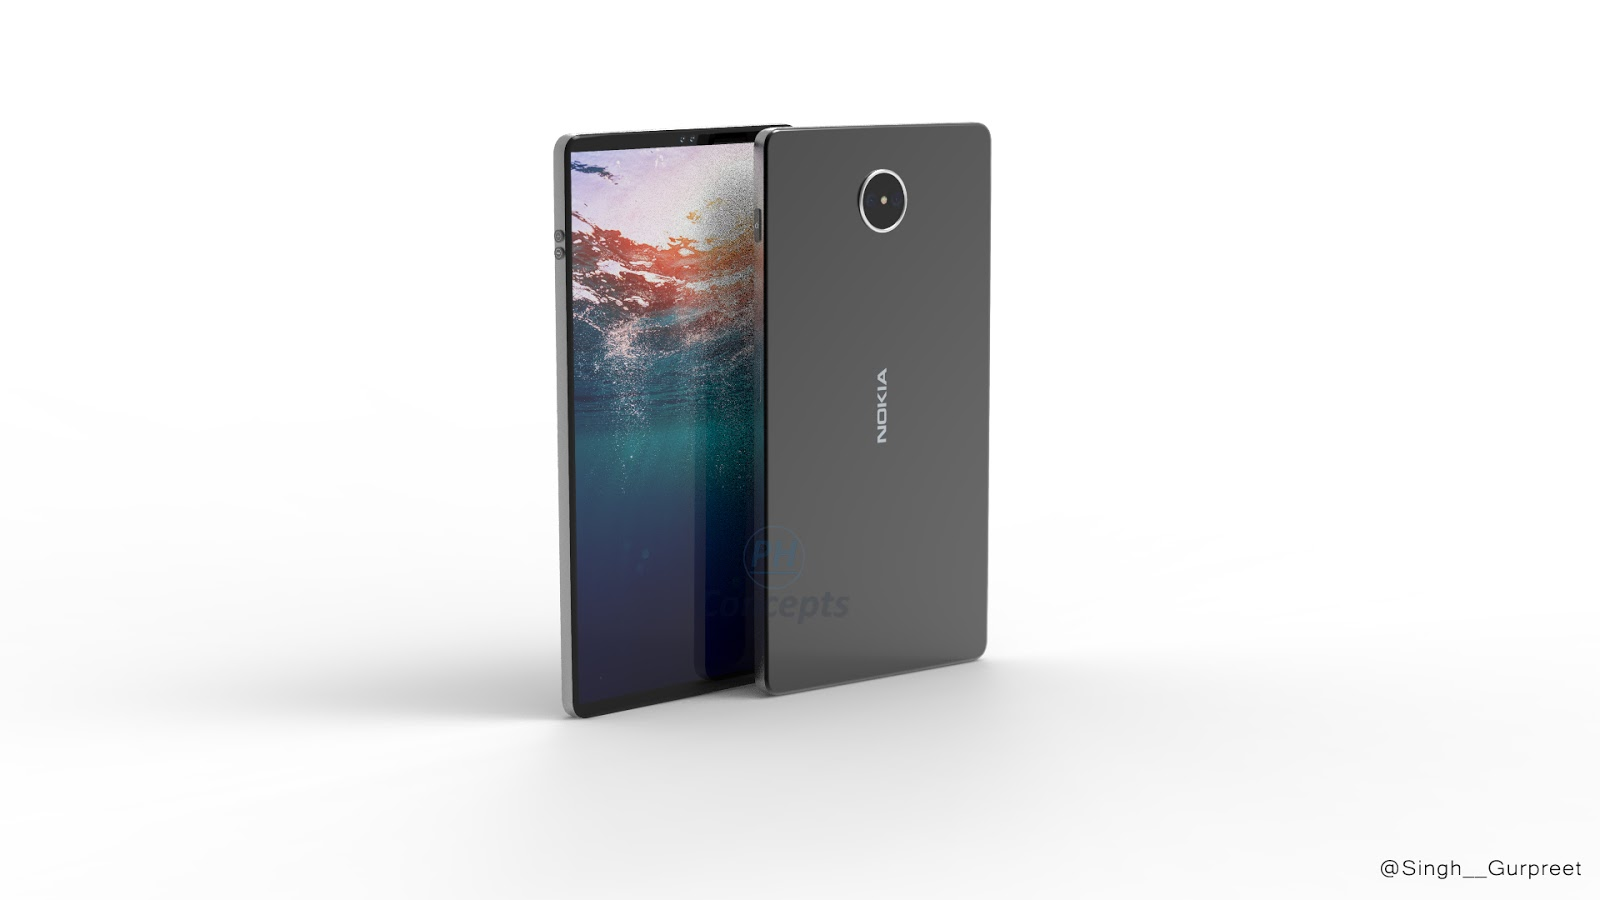 Nokia 11 Futuristic Smartphone 2018 Gadgets Arena